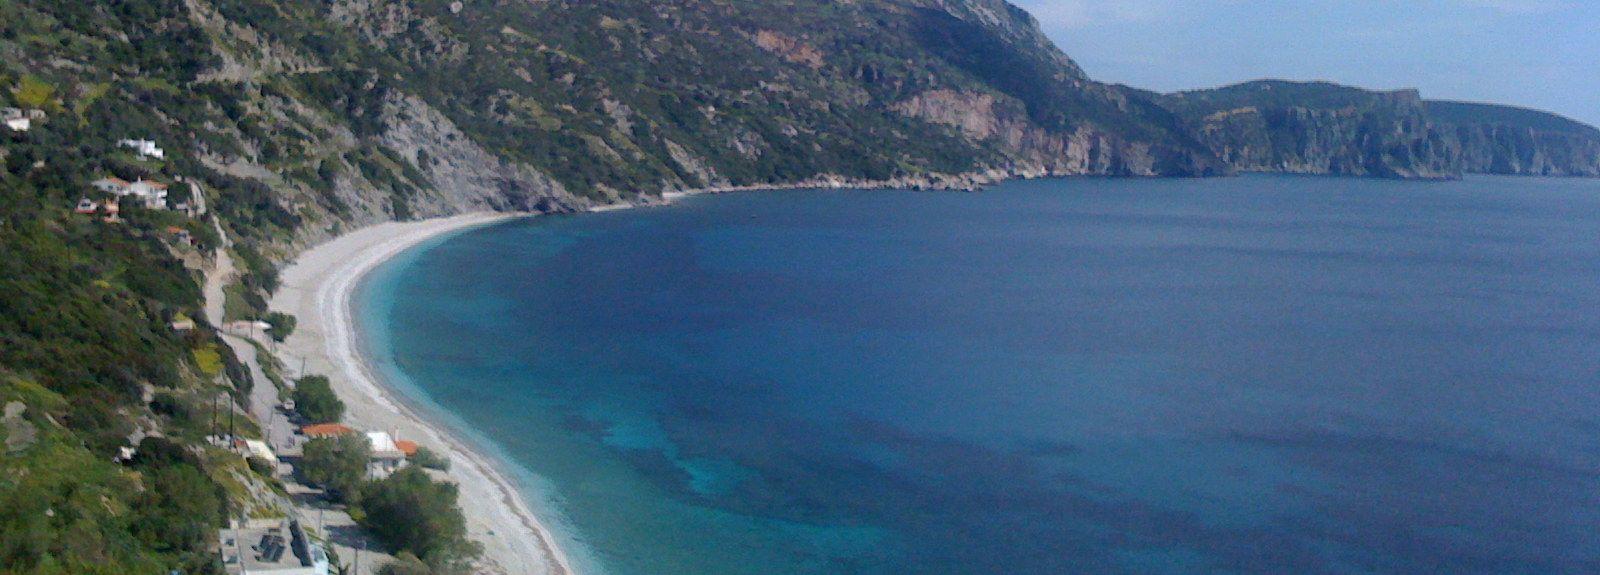 Kymi-Aliveri, Central Greece, Greece